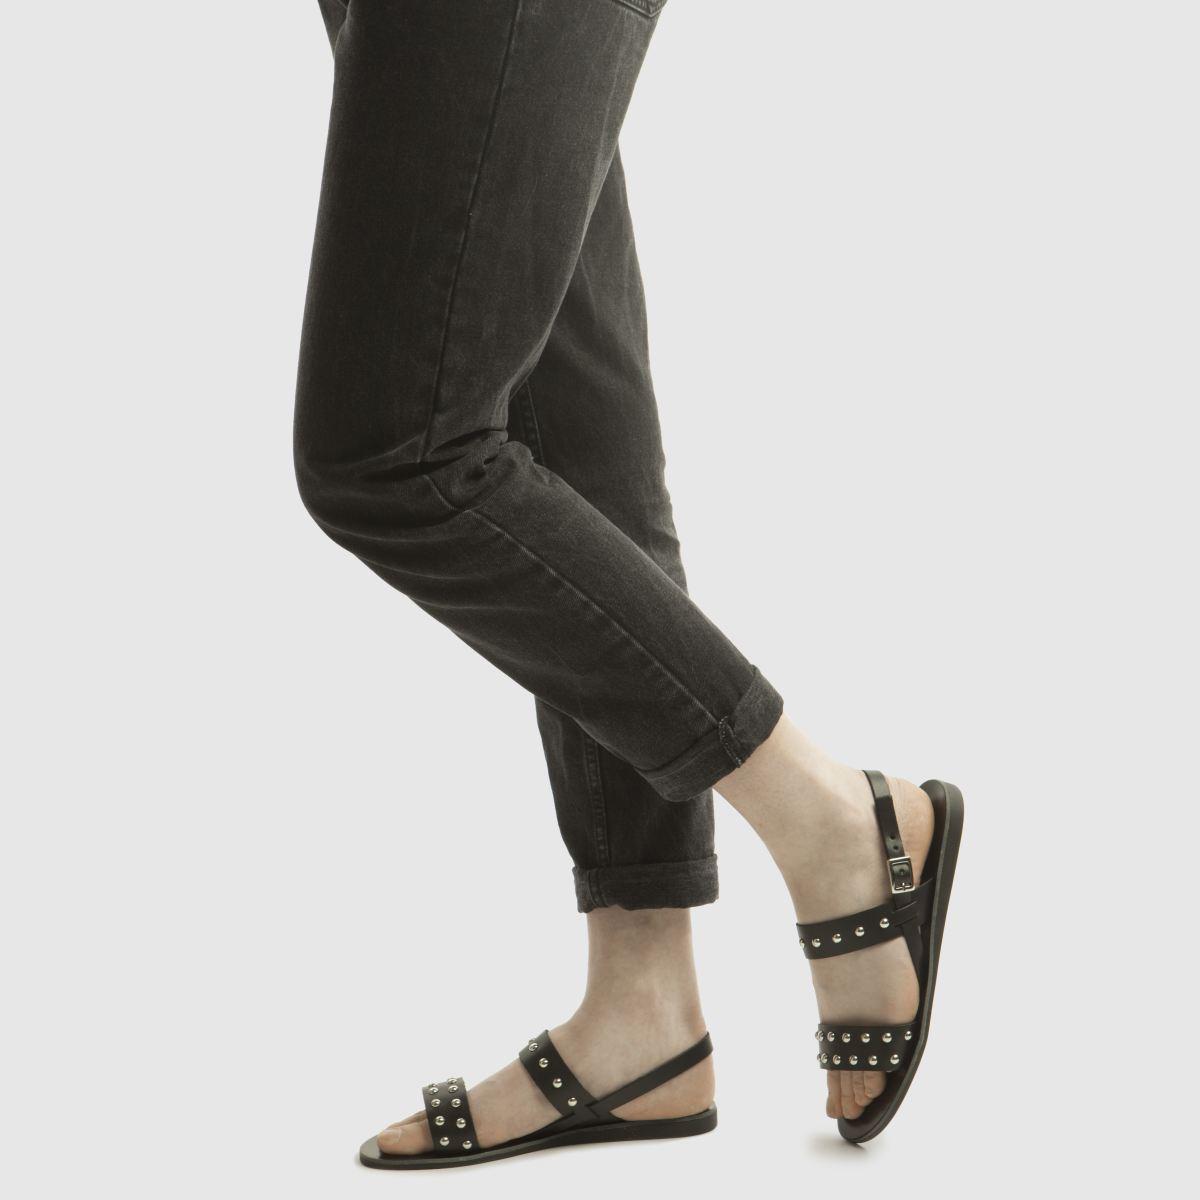 Damen   Schwarz schuh Zante Sandalen   Damen schuh Gute Qualität beliebte Schuhe 80fd61